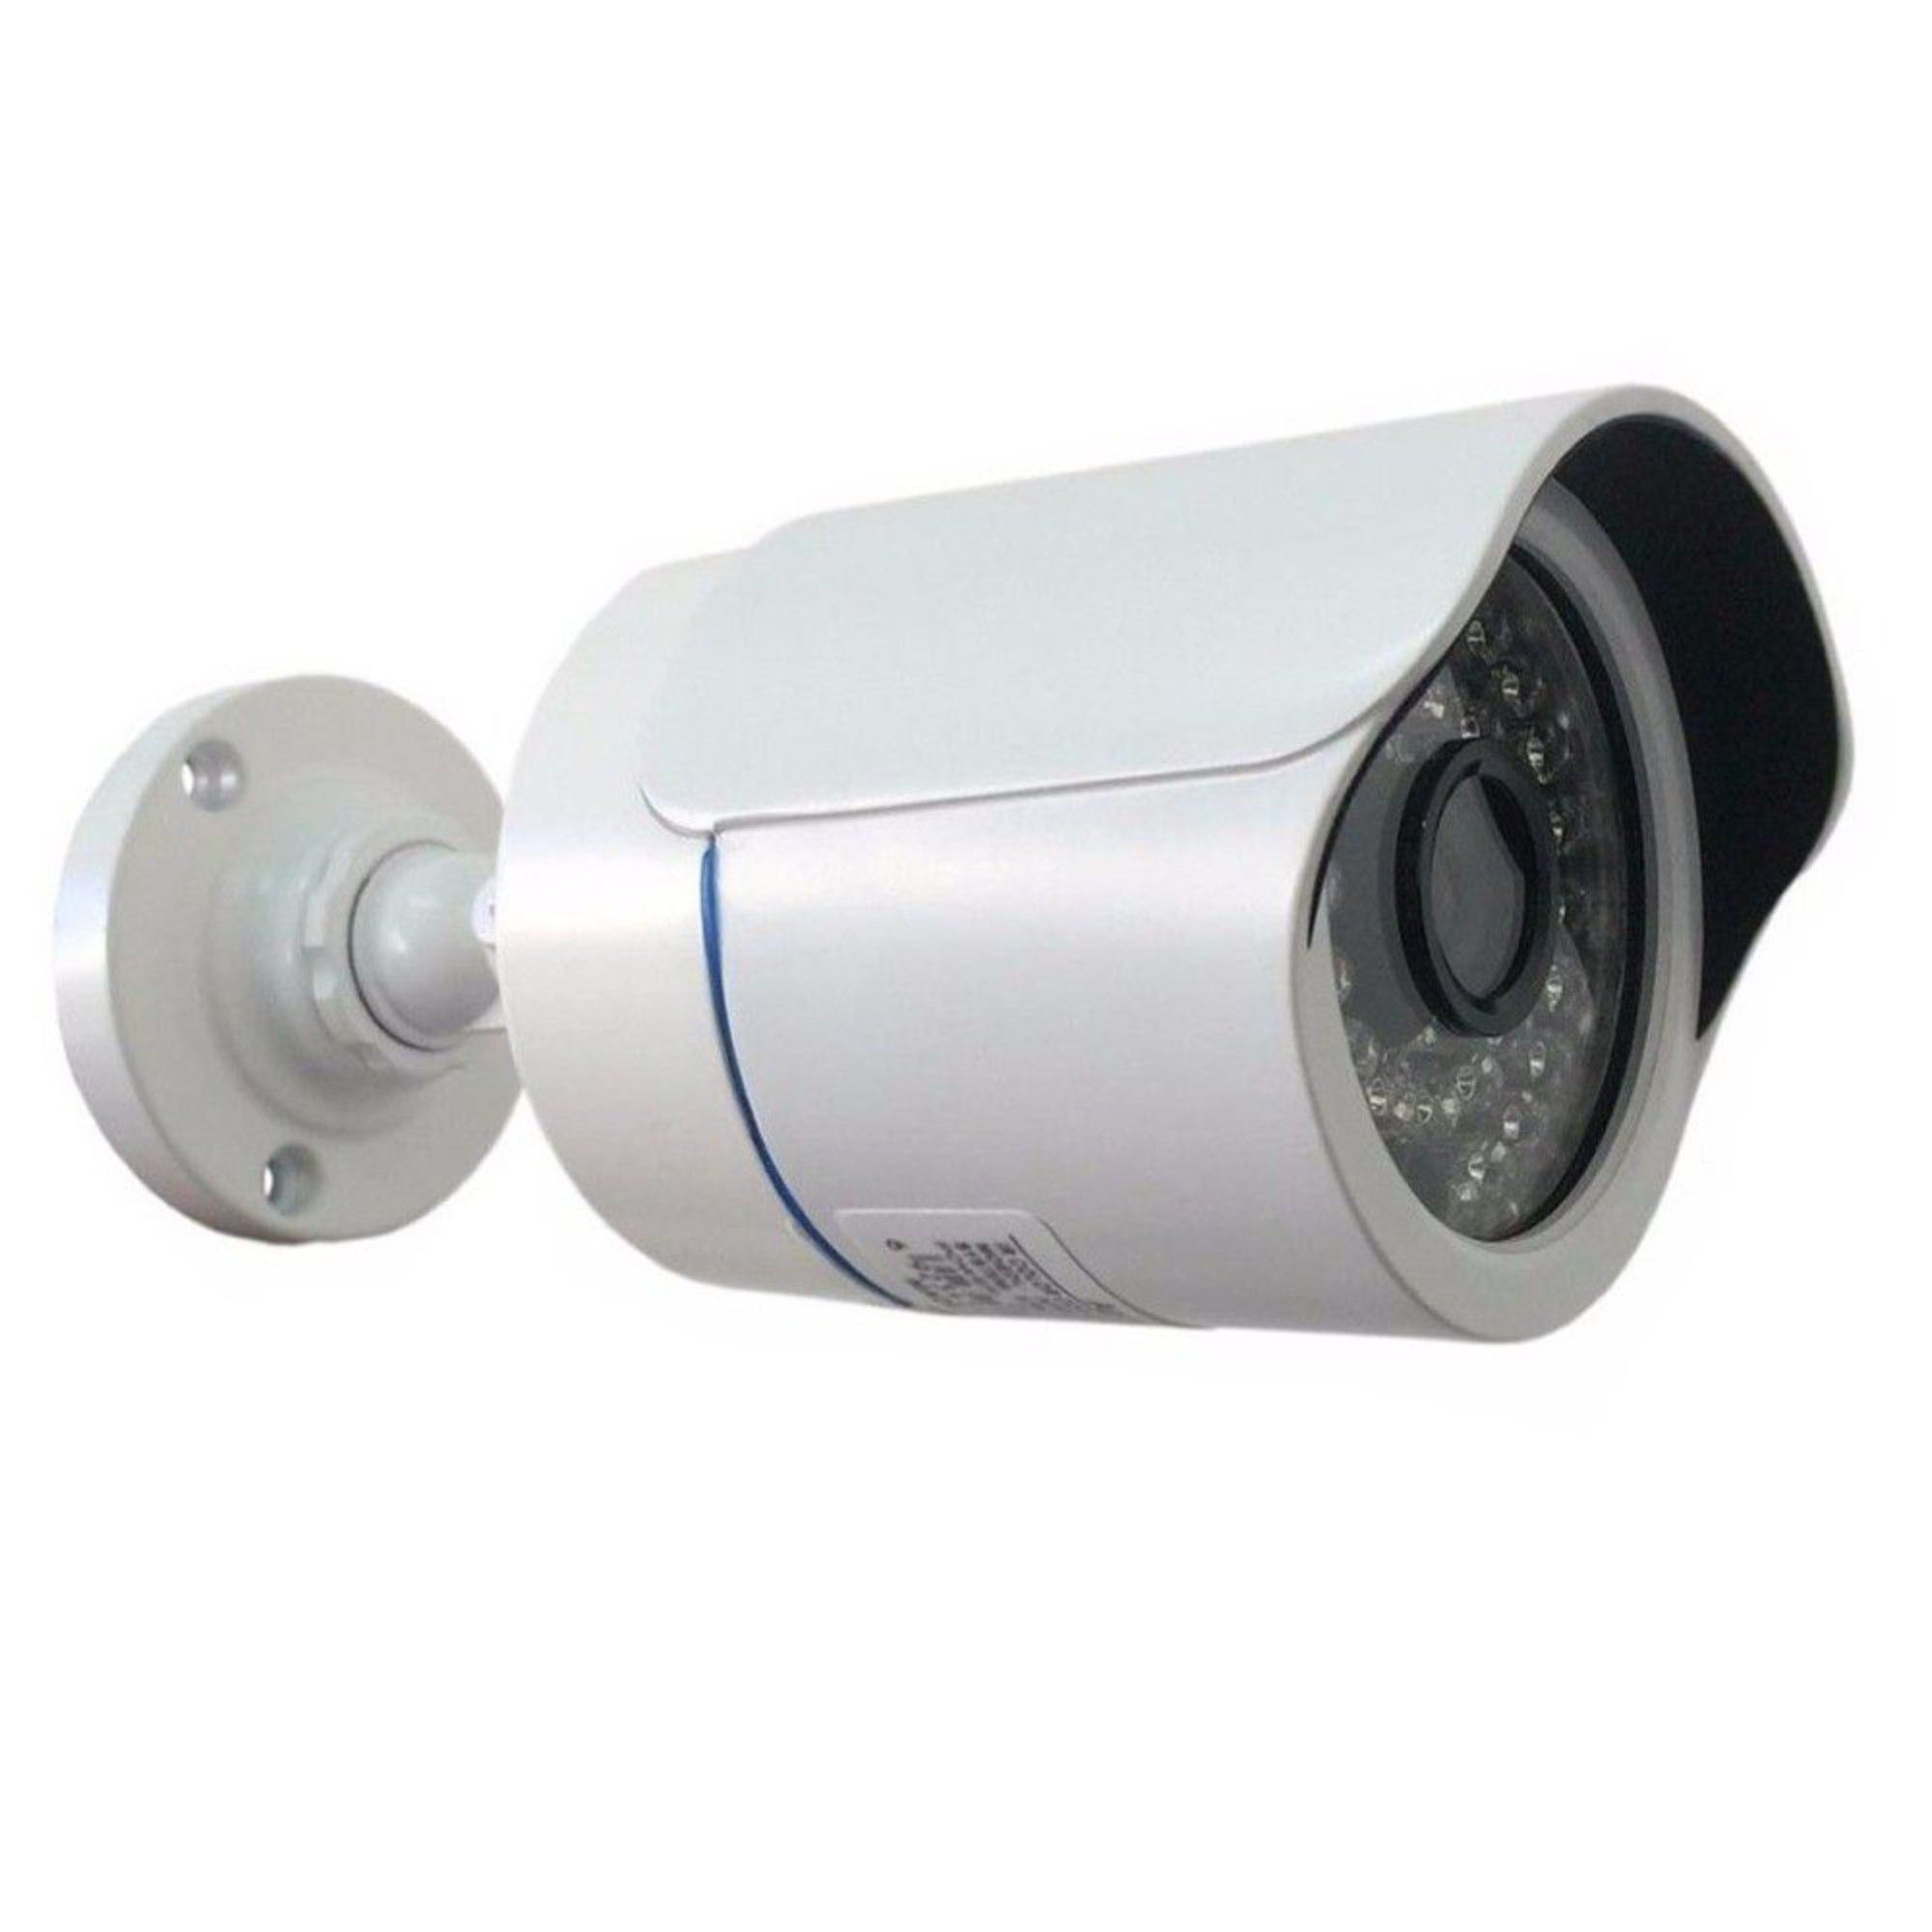 Kit CFTV Jortan Completo 6 Câmeras AHD 720p DVR 8 Canais